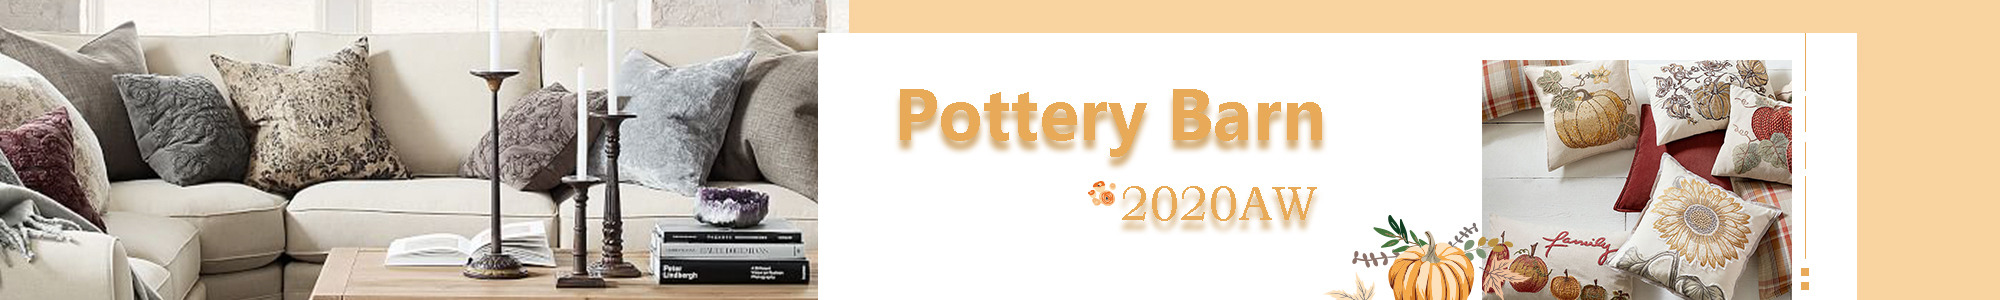 Pottery Barn Banner